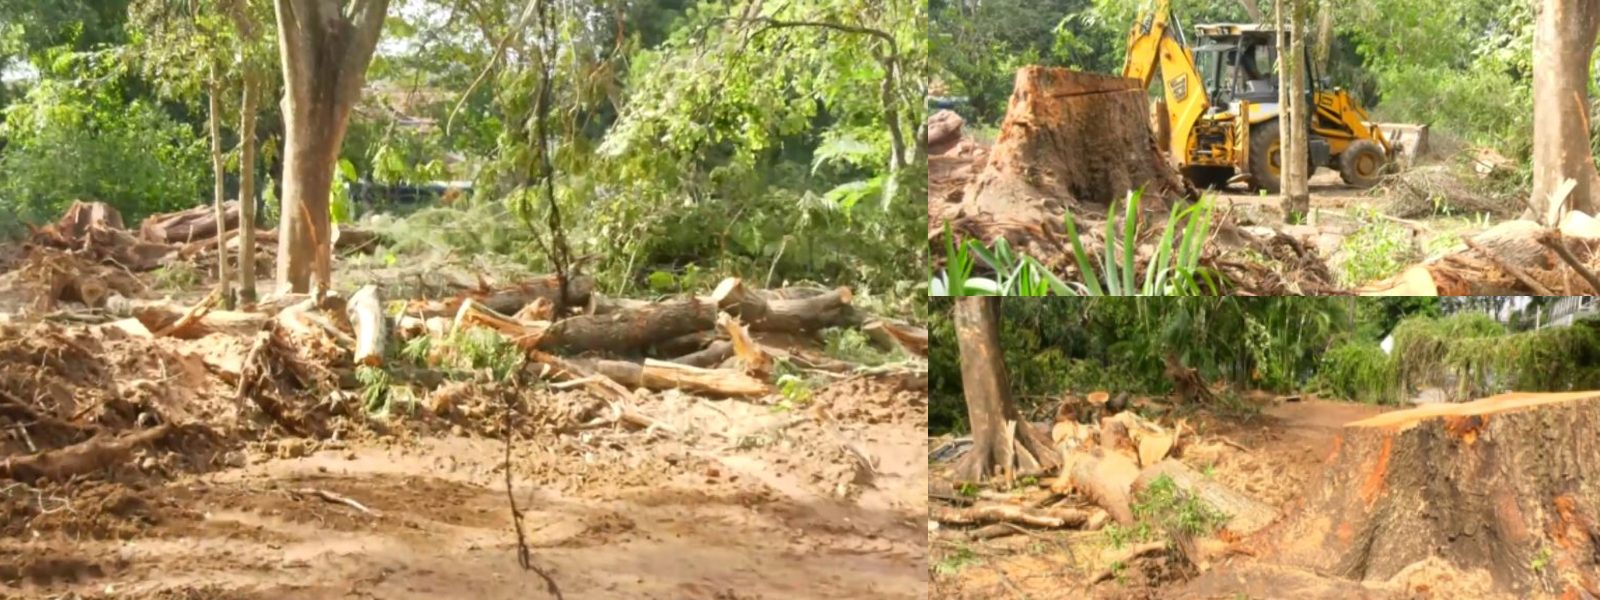 RAJAPIHILLA PARK DESTRUCTION; CEA ORDERED TO SUBMIT REPORT